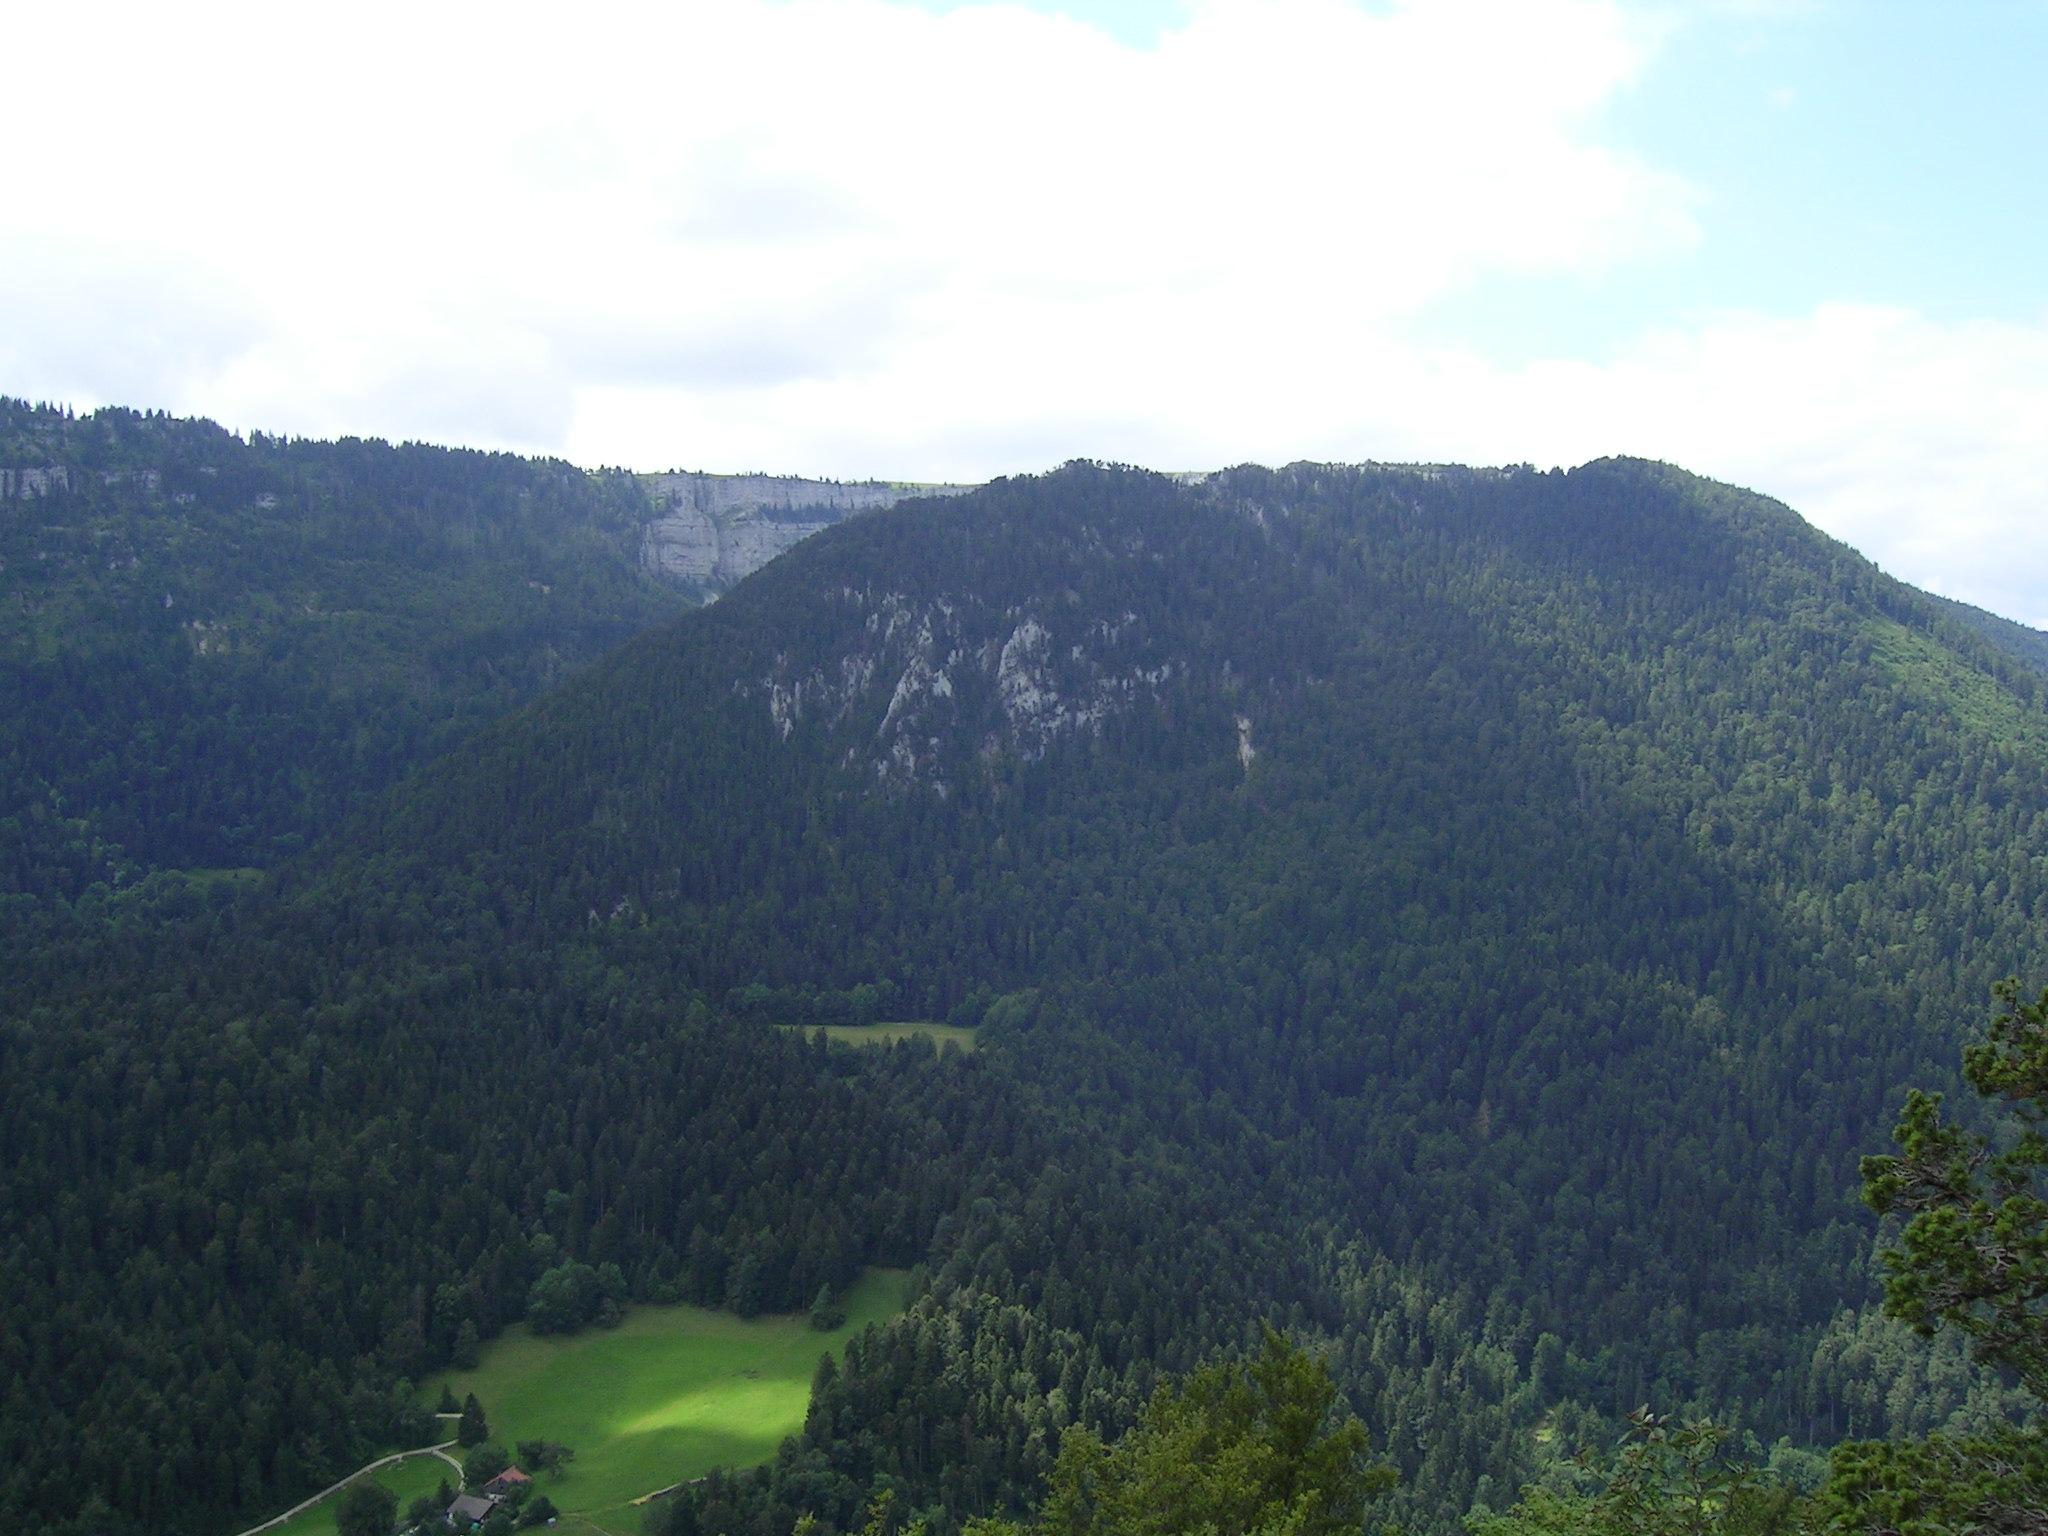 Val de Travers 11.07.09 001